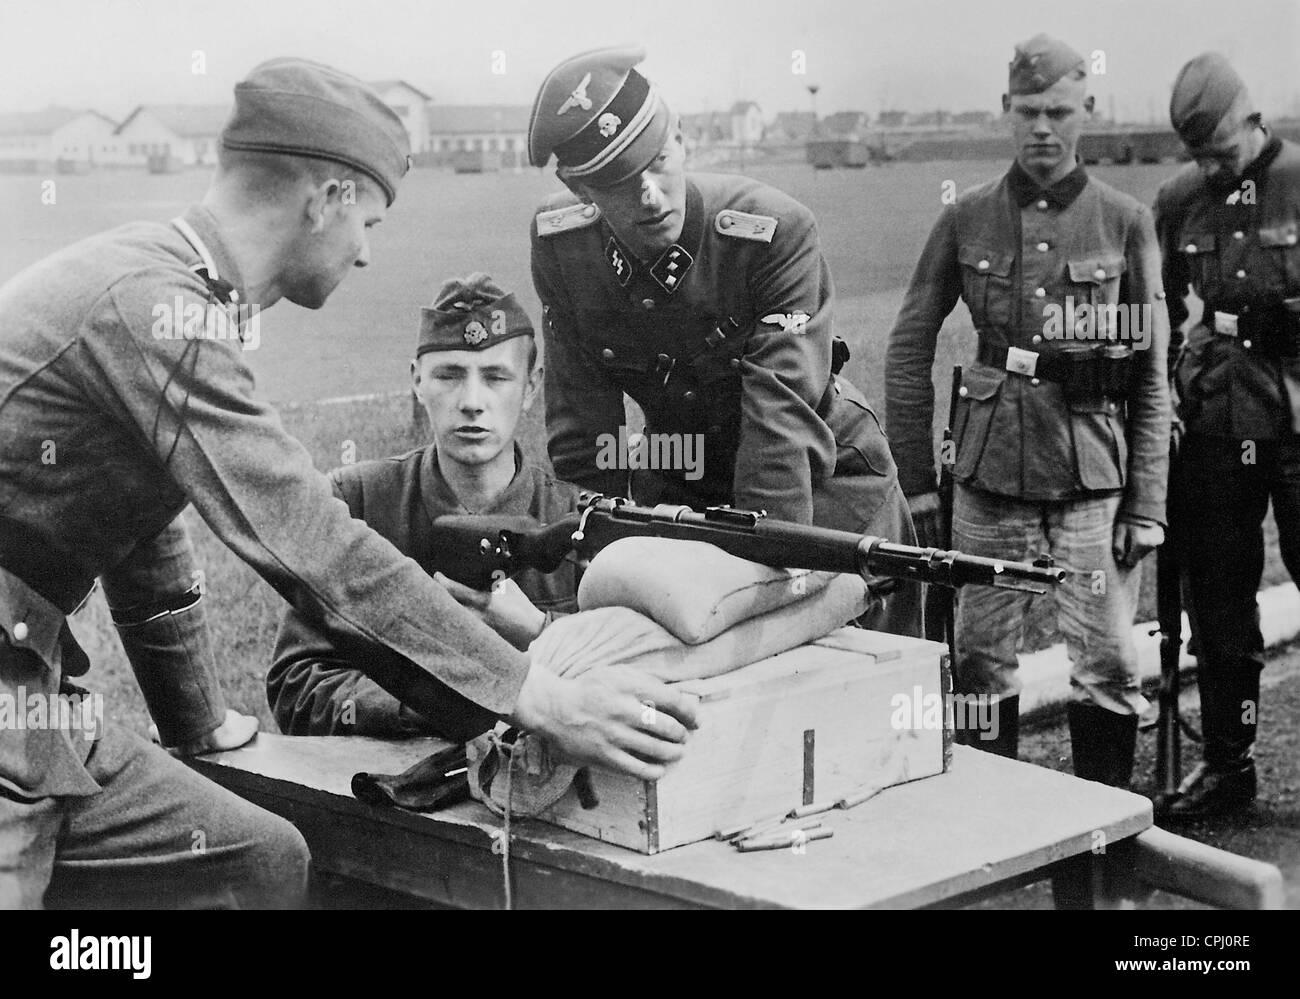 Belgian Volunteers Of The Waffen SS, 1942 Stock Photo